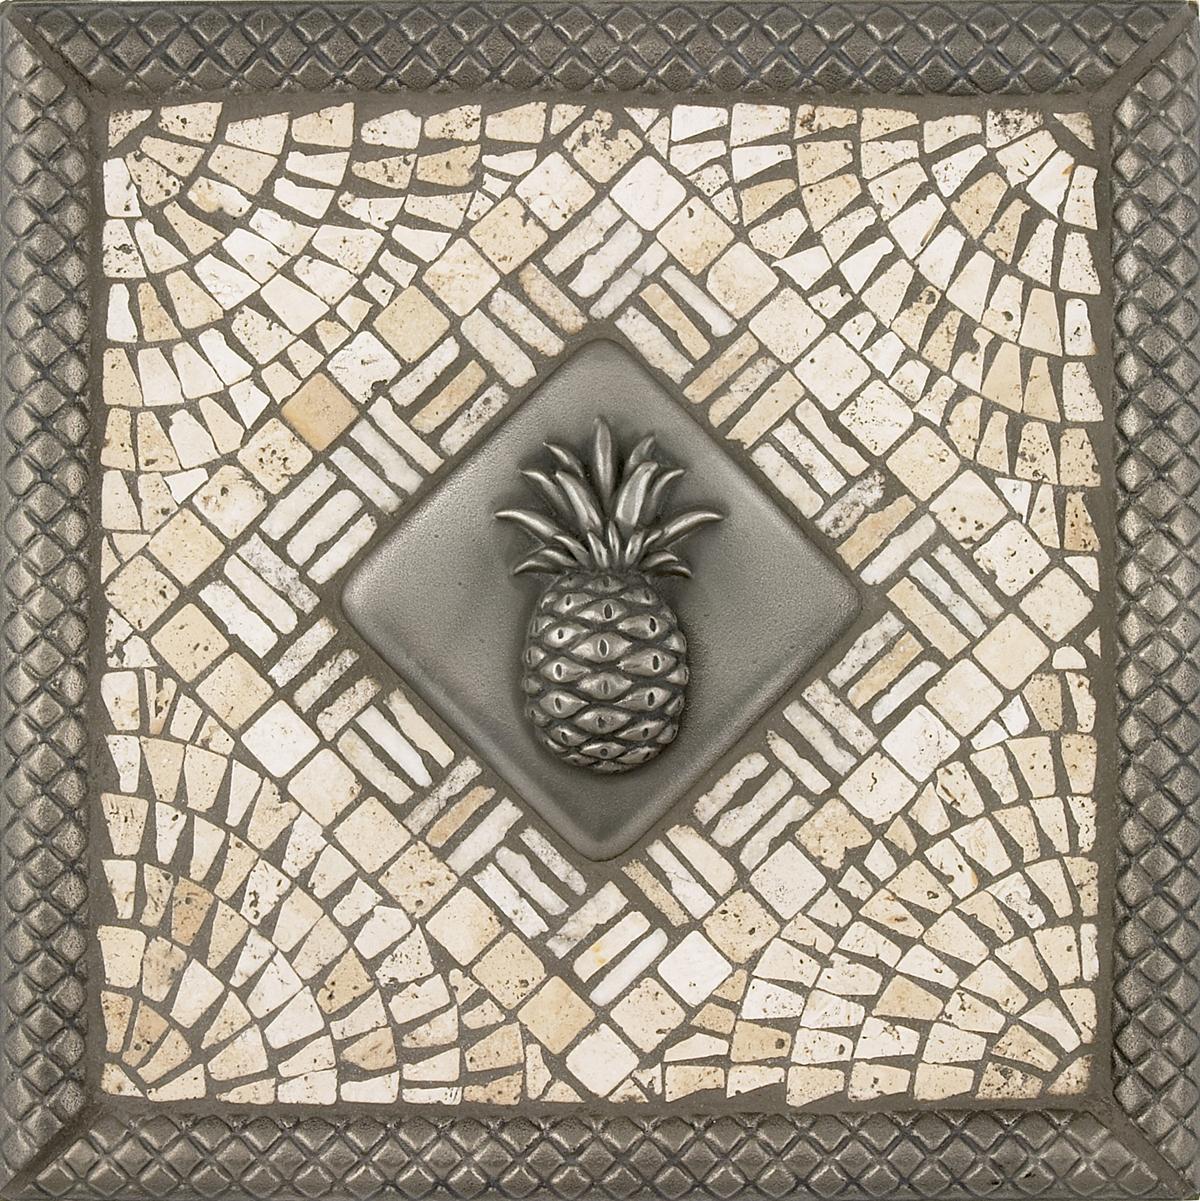 Pineapple Mosaic Tile Backsplash Medallion 12 Inches